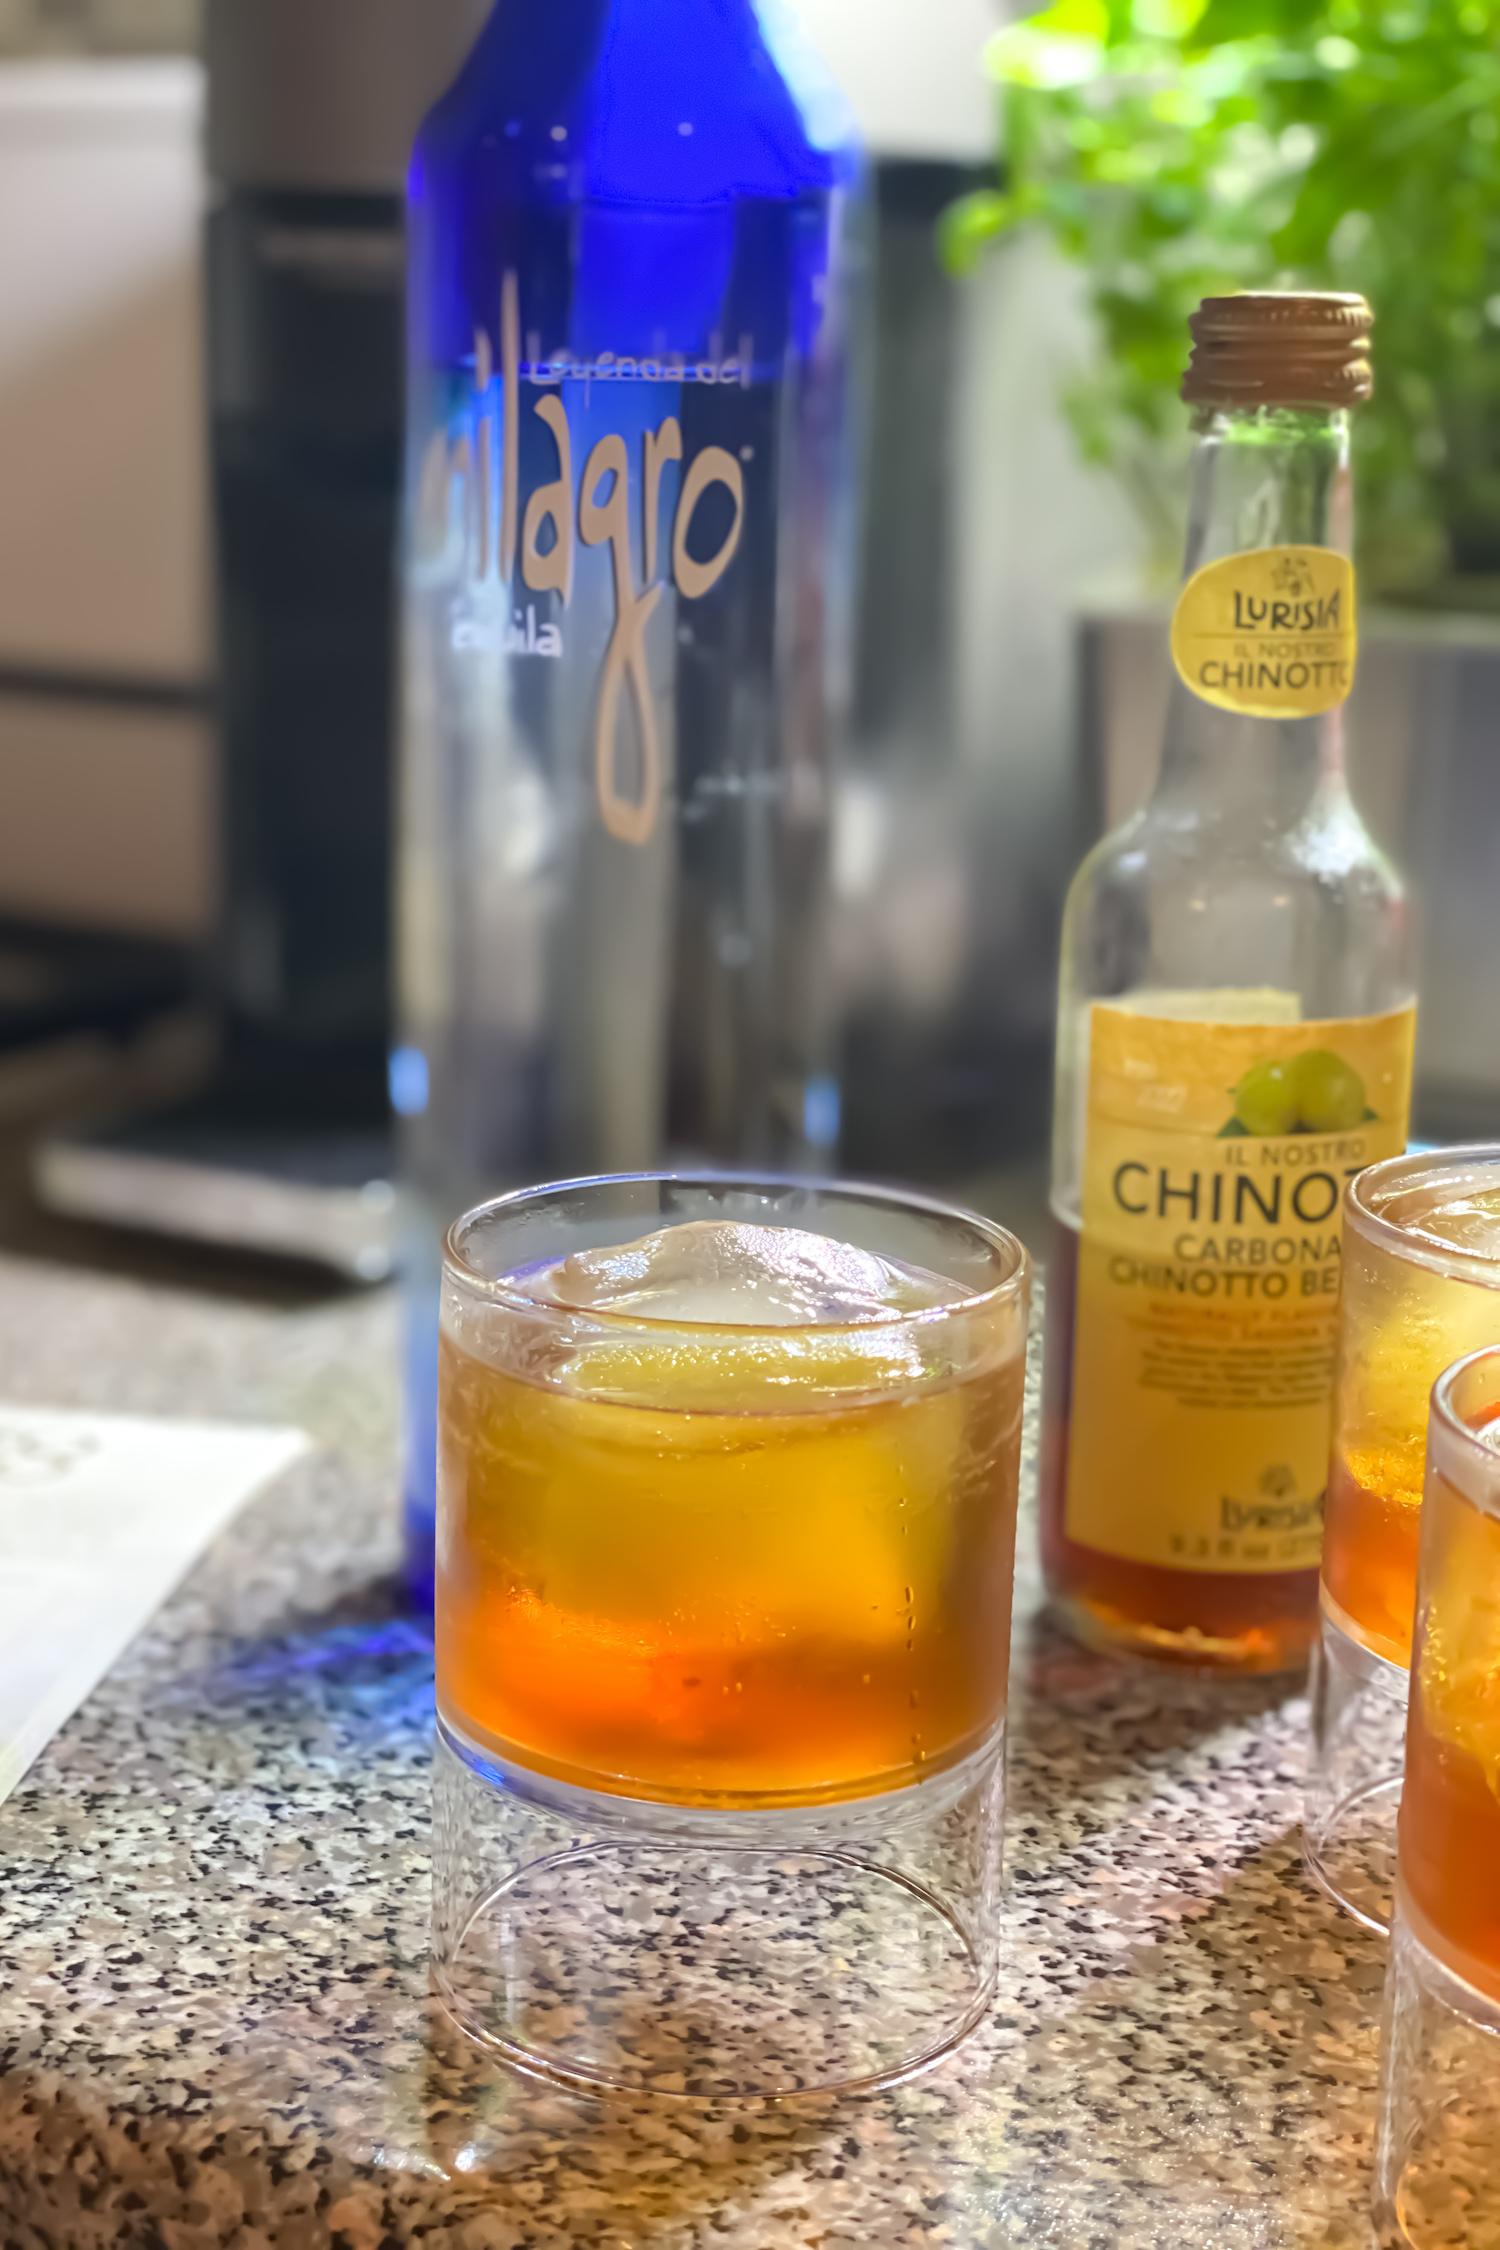 Mimeo Cocktail Recipe